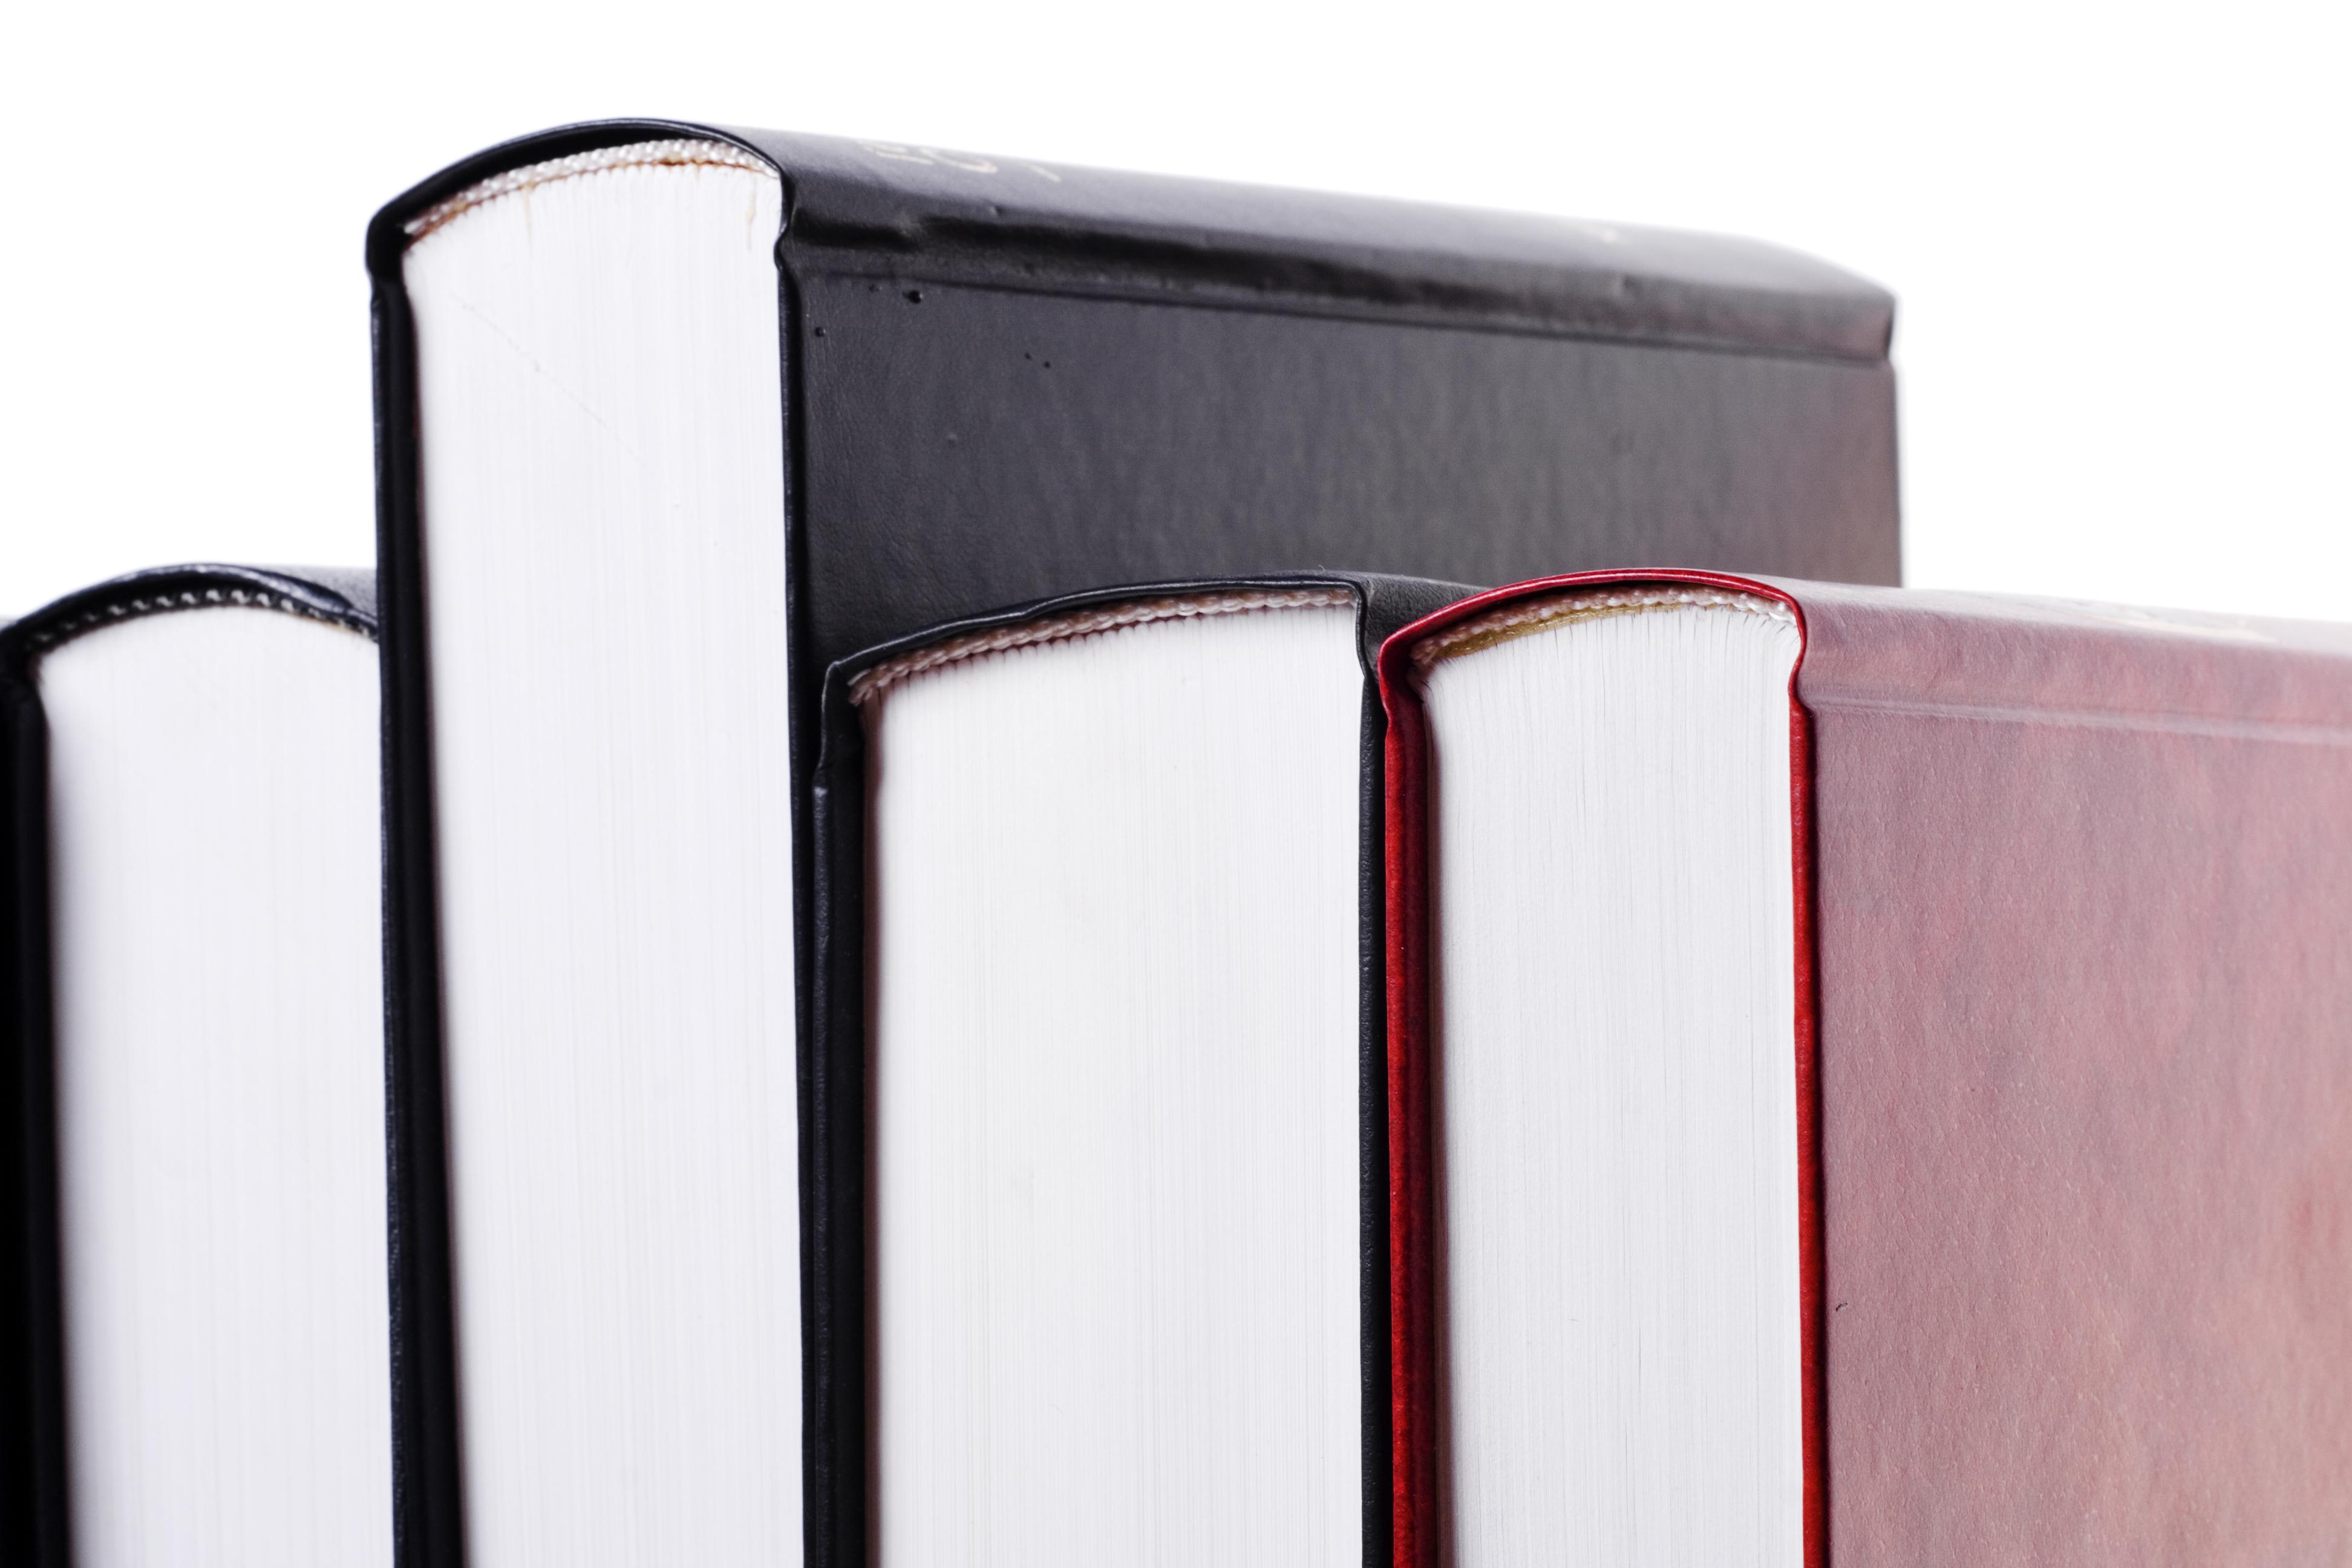 Books, Book, Education, Guidebook, Heap, HQ Photo